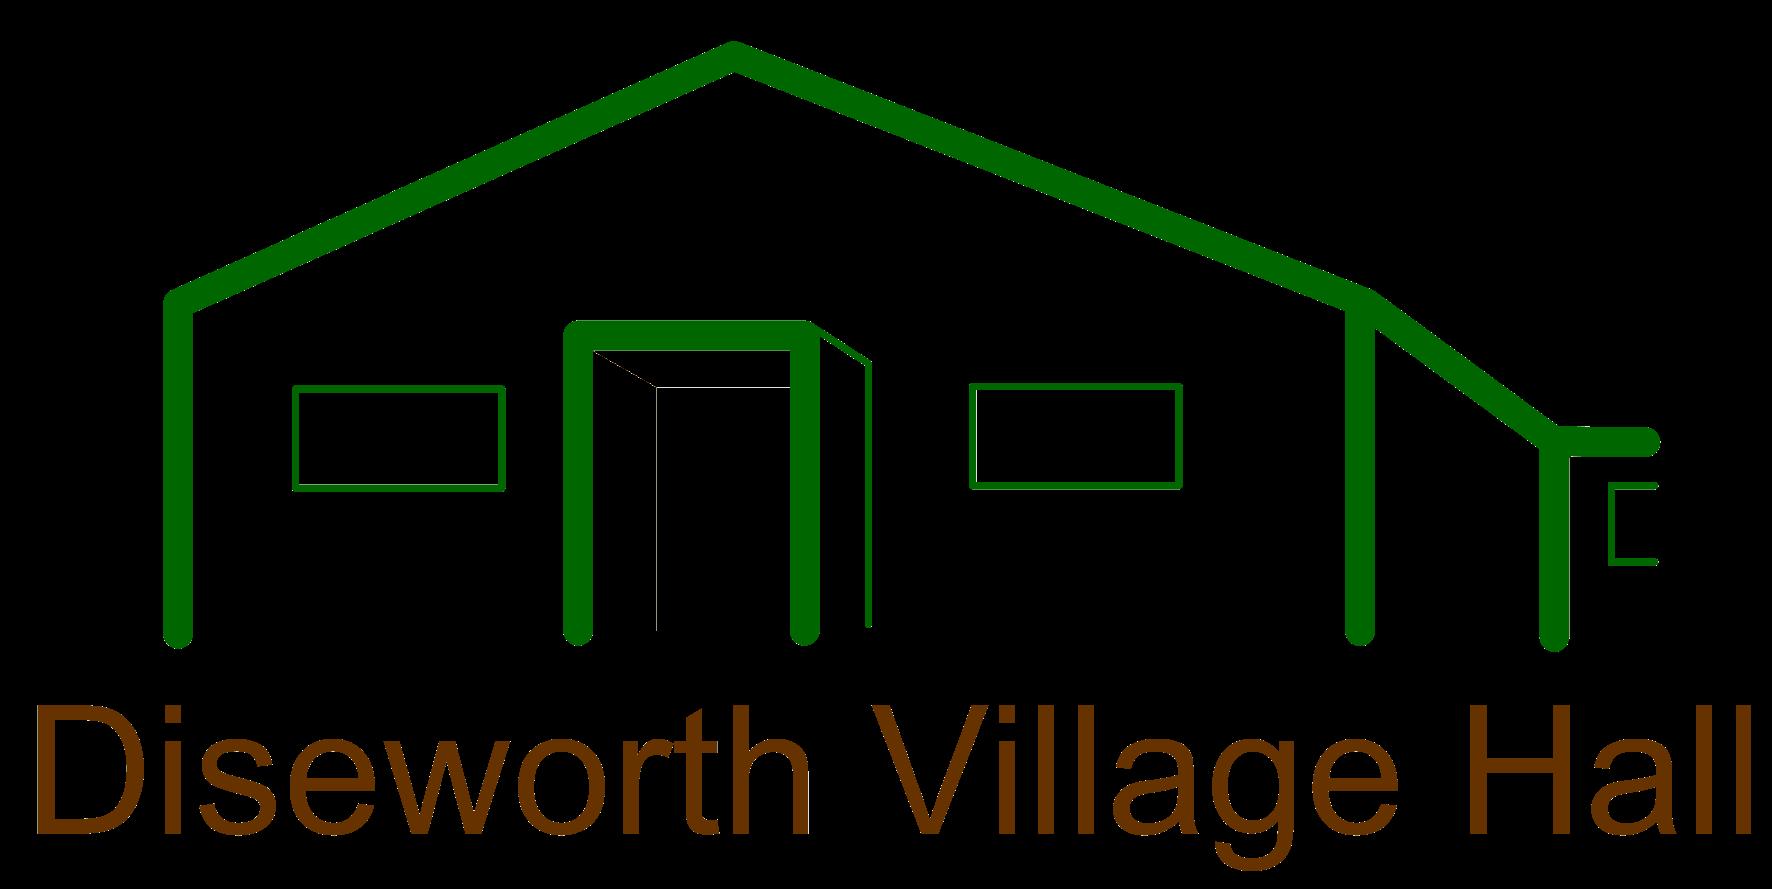 Diseworth Village Hall